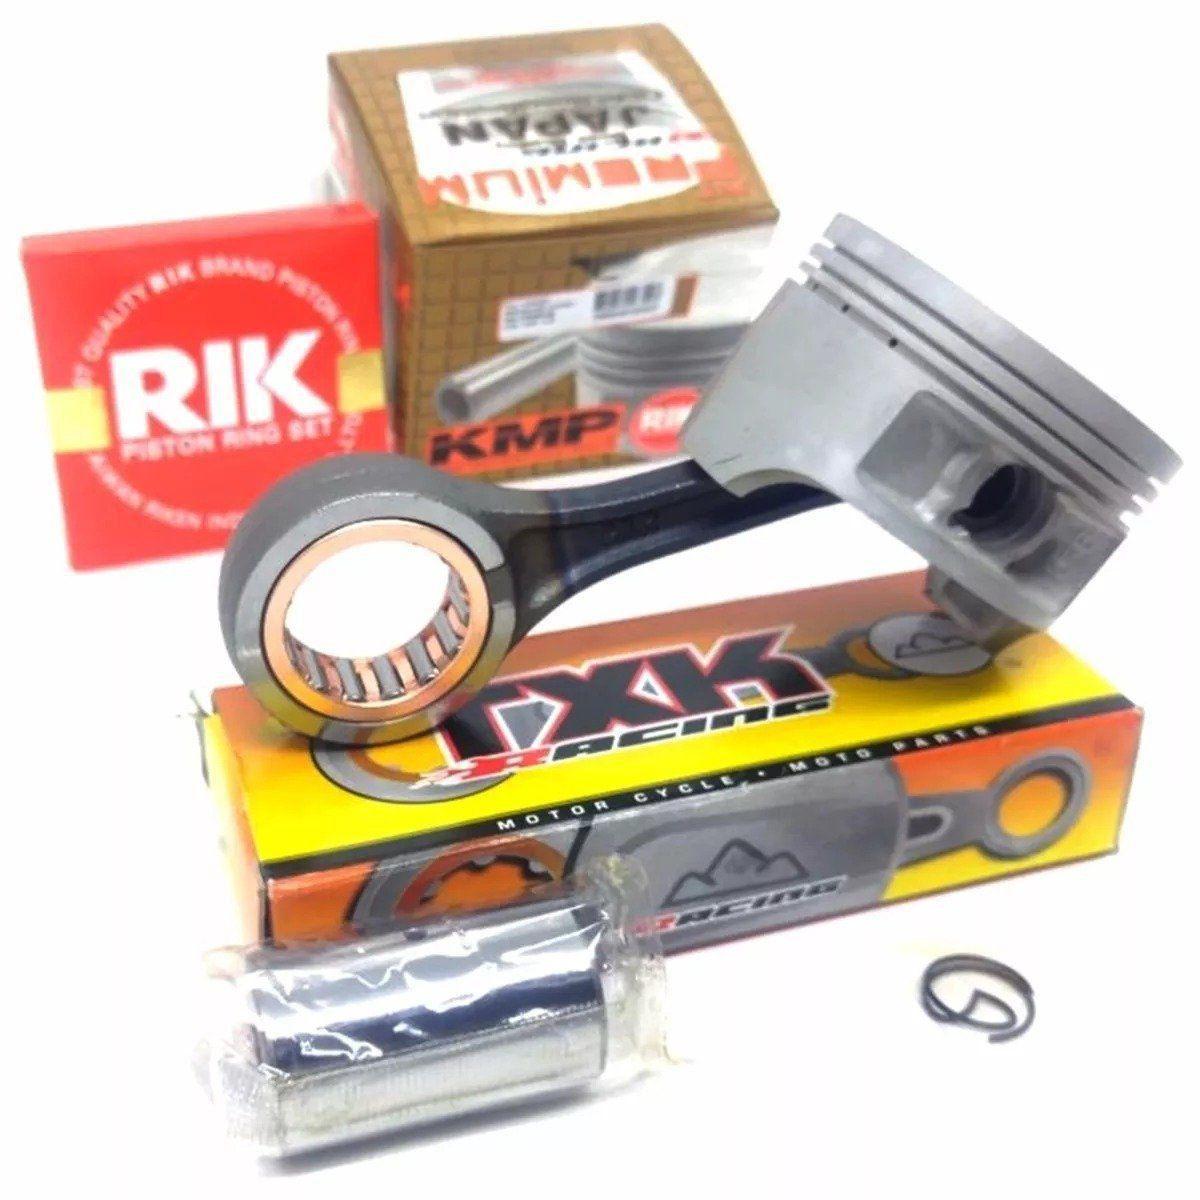 Kit Pistão Xt 225 Kmp Premium Std á 2.00mm Com Biela Txk Pino 16mm Para Cg 150